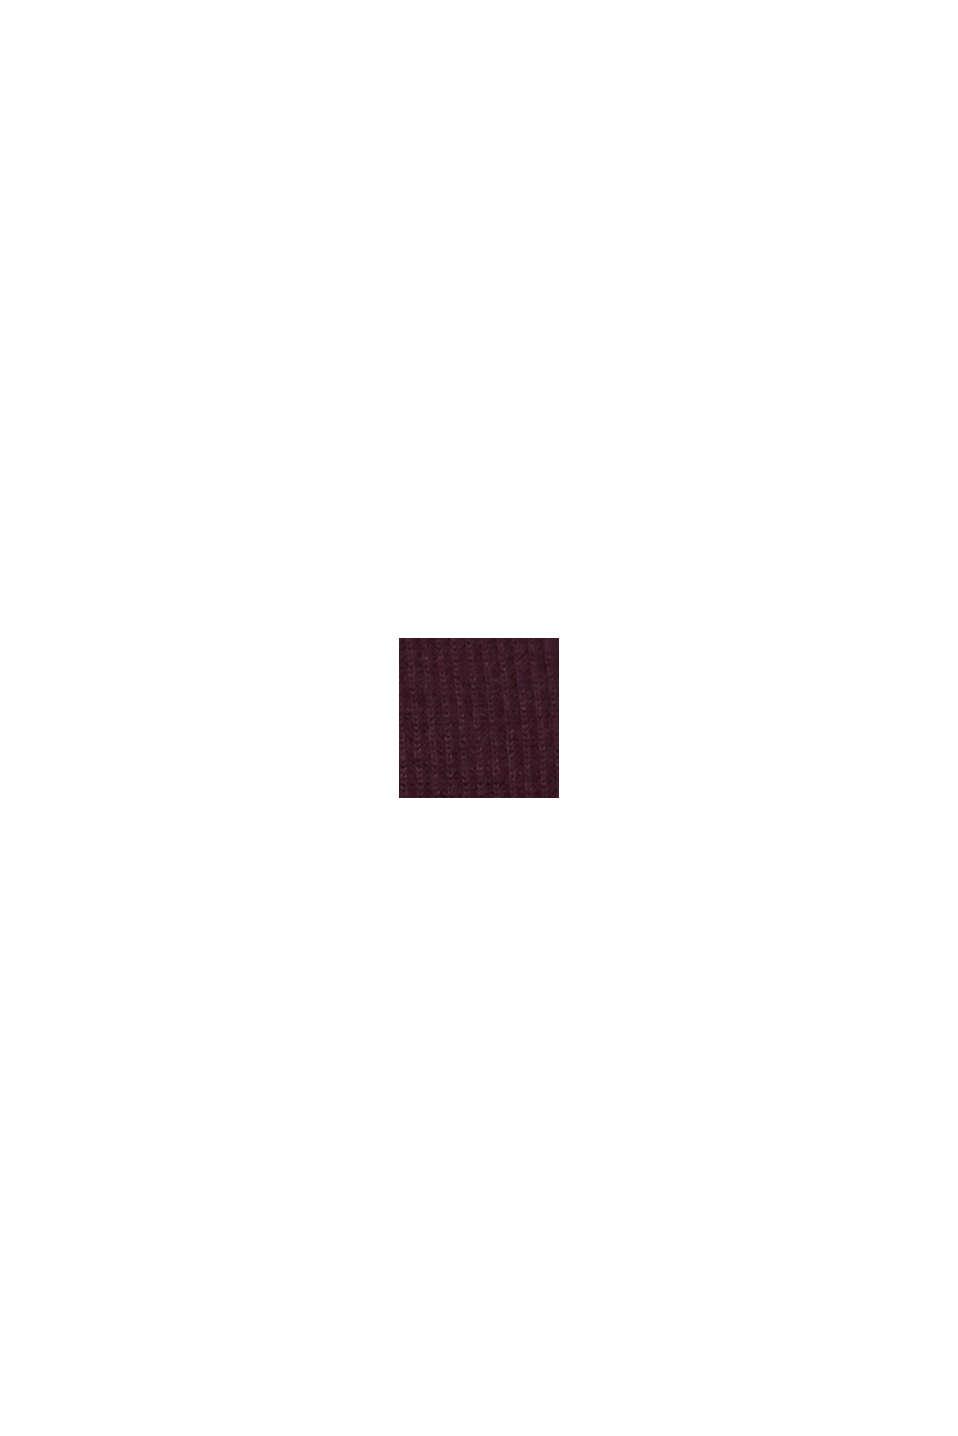 Wool blend: jumper knit in rib stitch, BORDEAUX RED, swatch